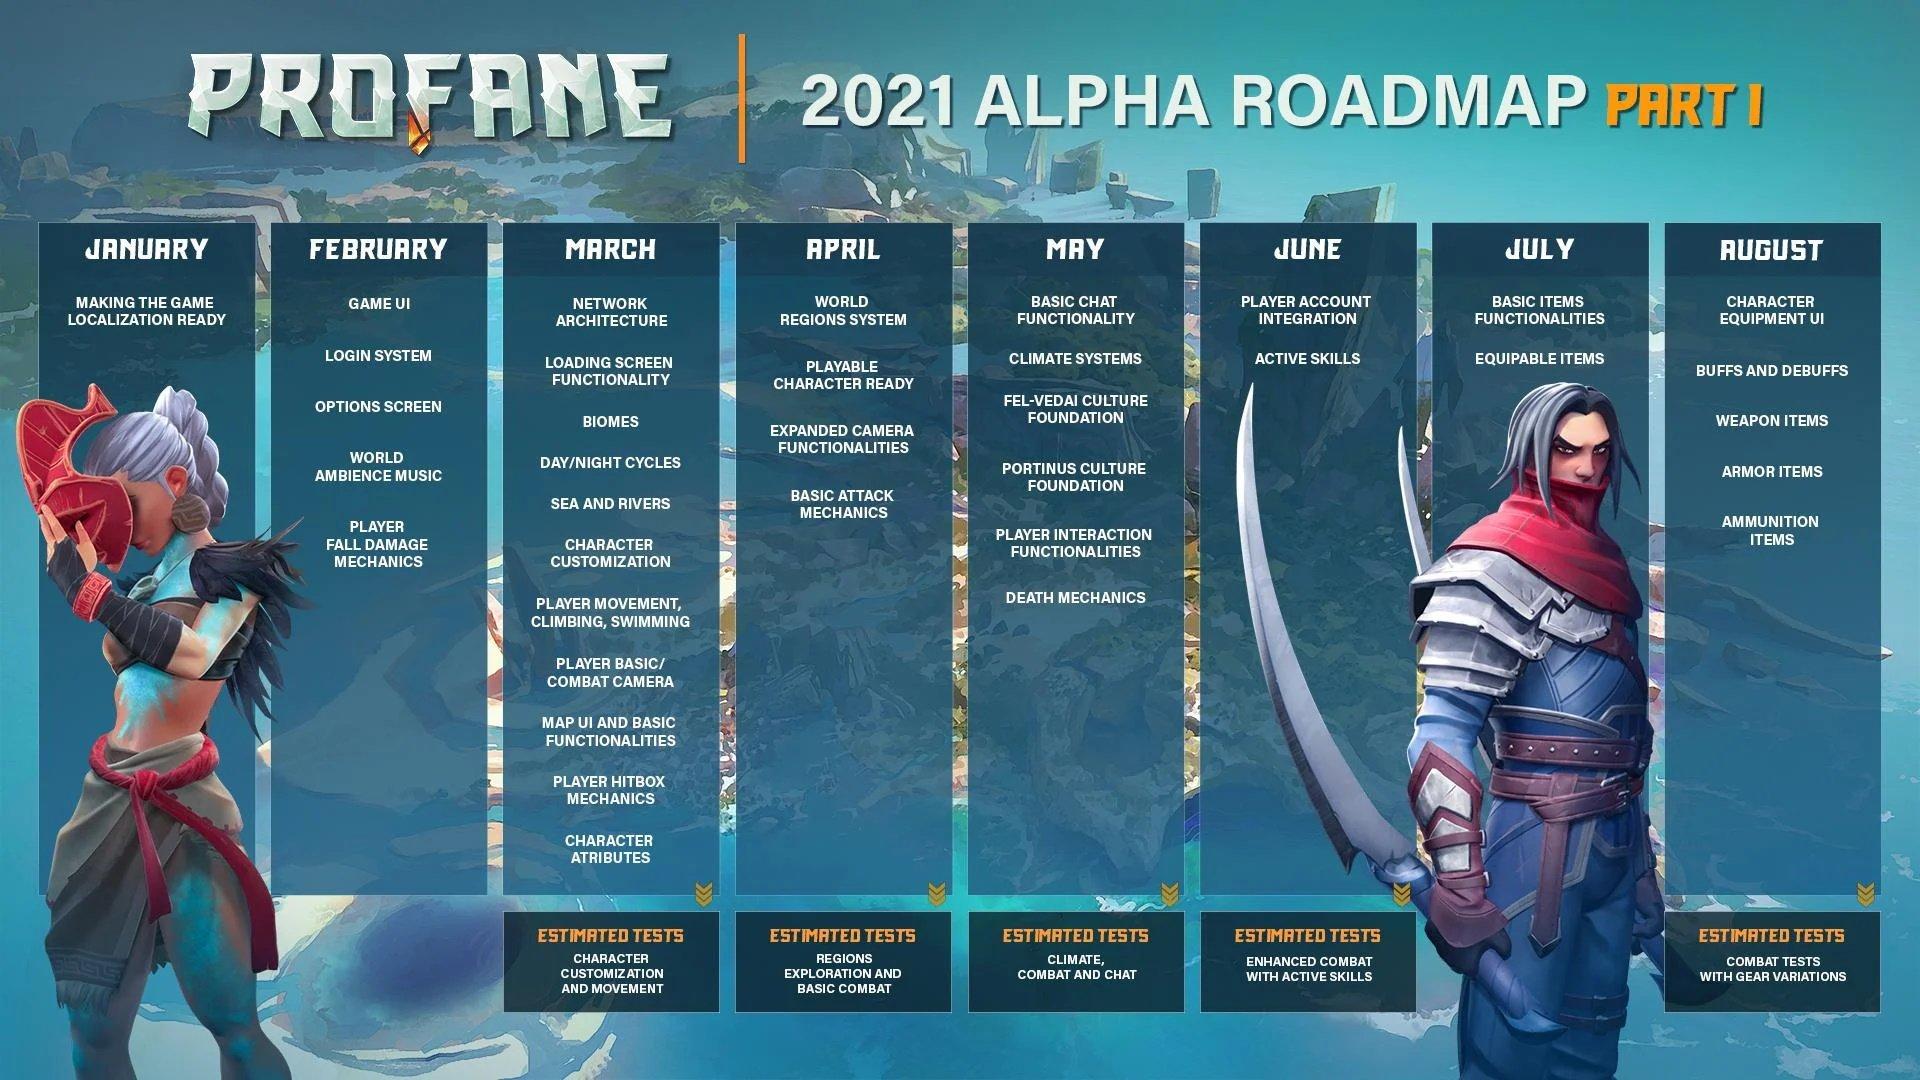 Profane Ecco la roadmap dei primi 8 mesi dell'alpha del sandbox brasiliano